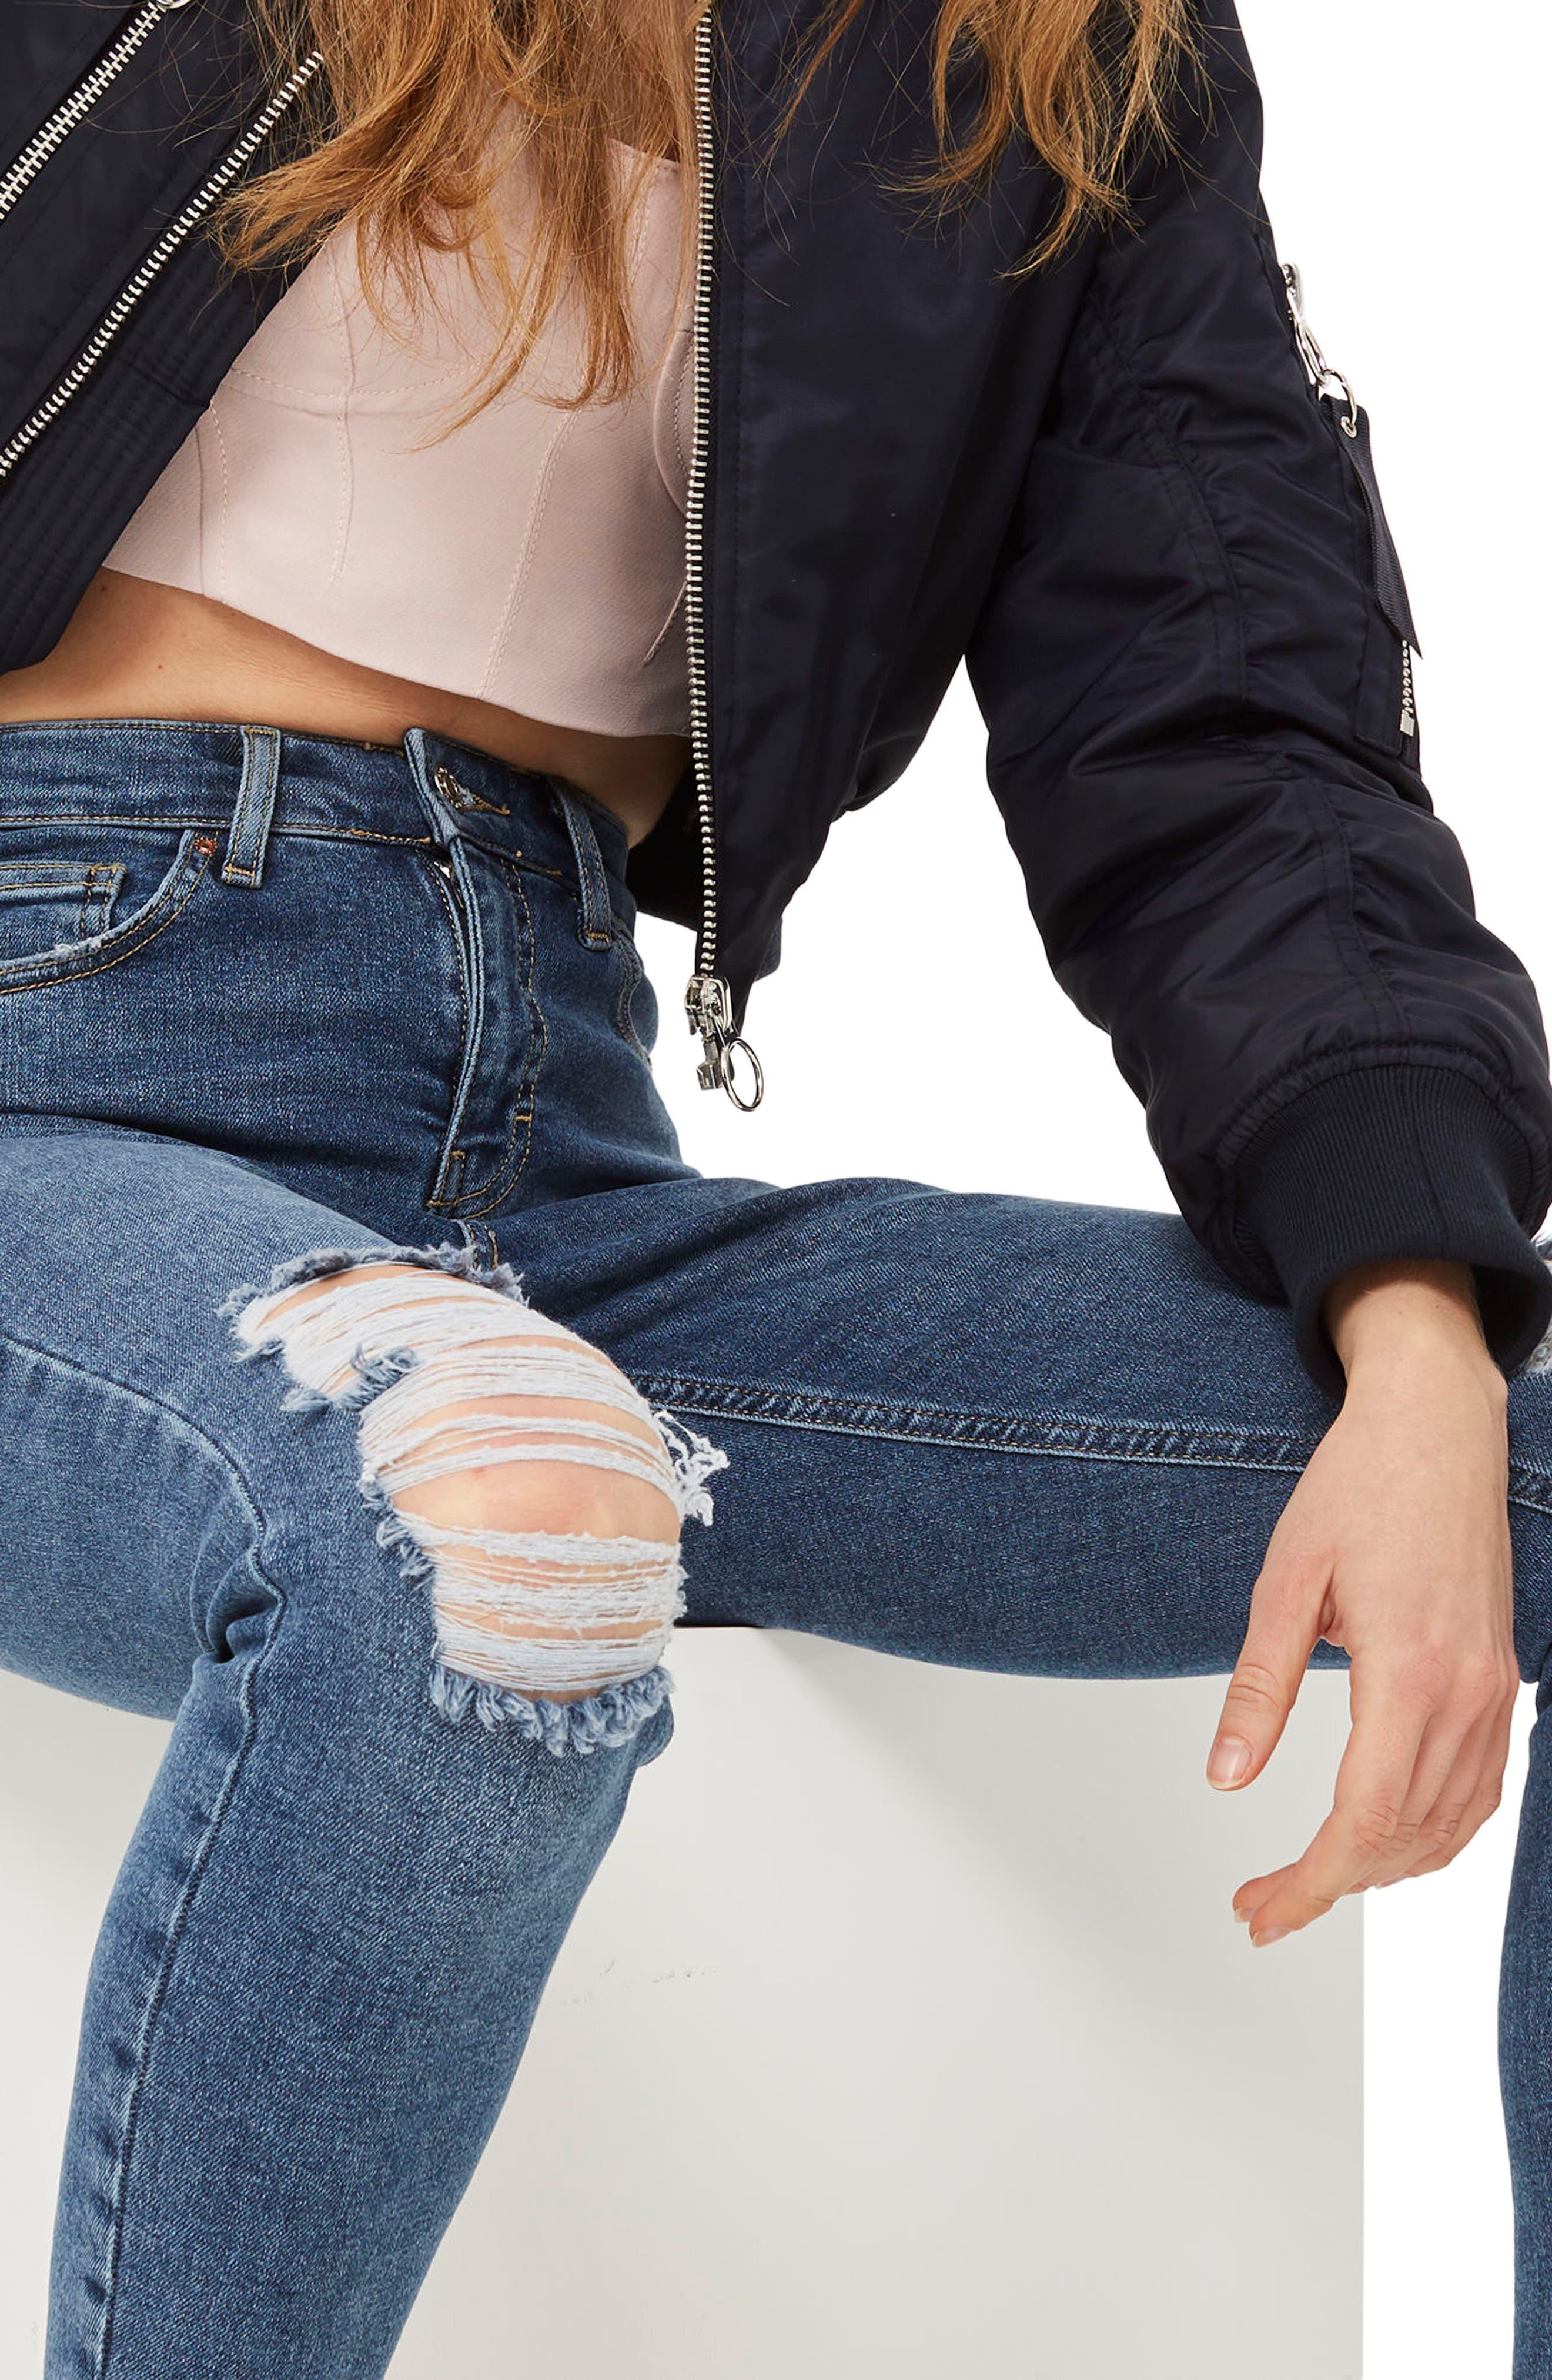 Topshop Jamie Petite Ripped Jeans